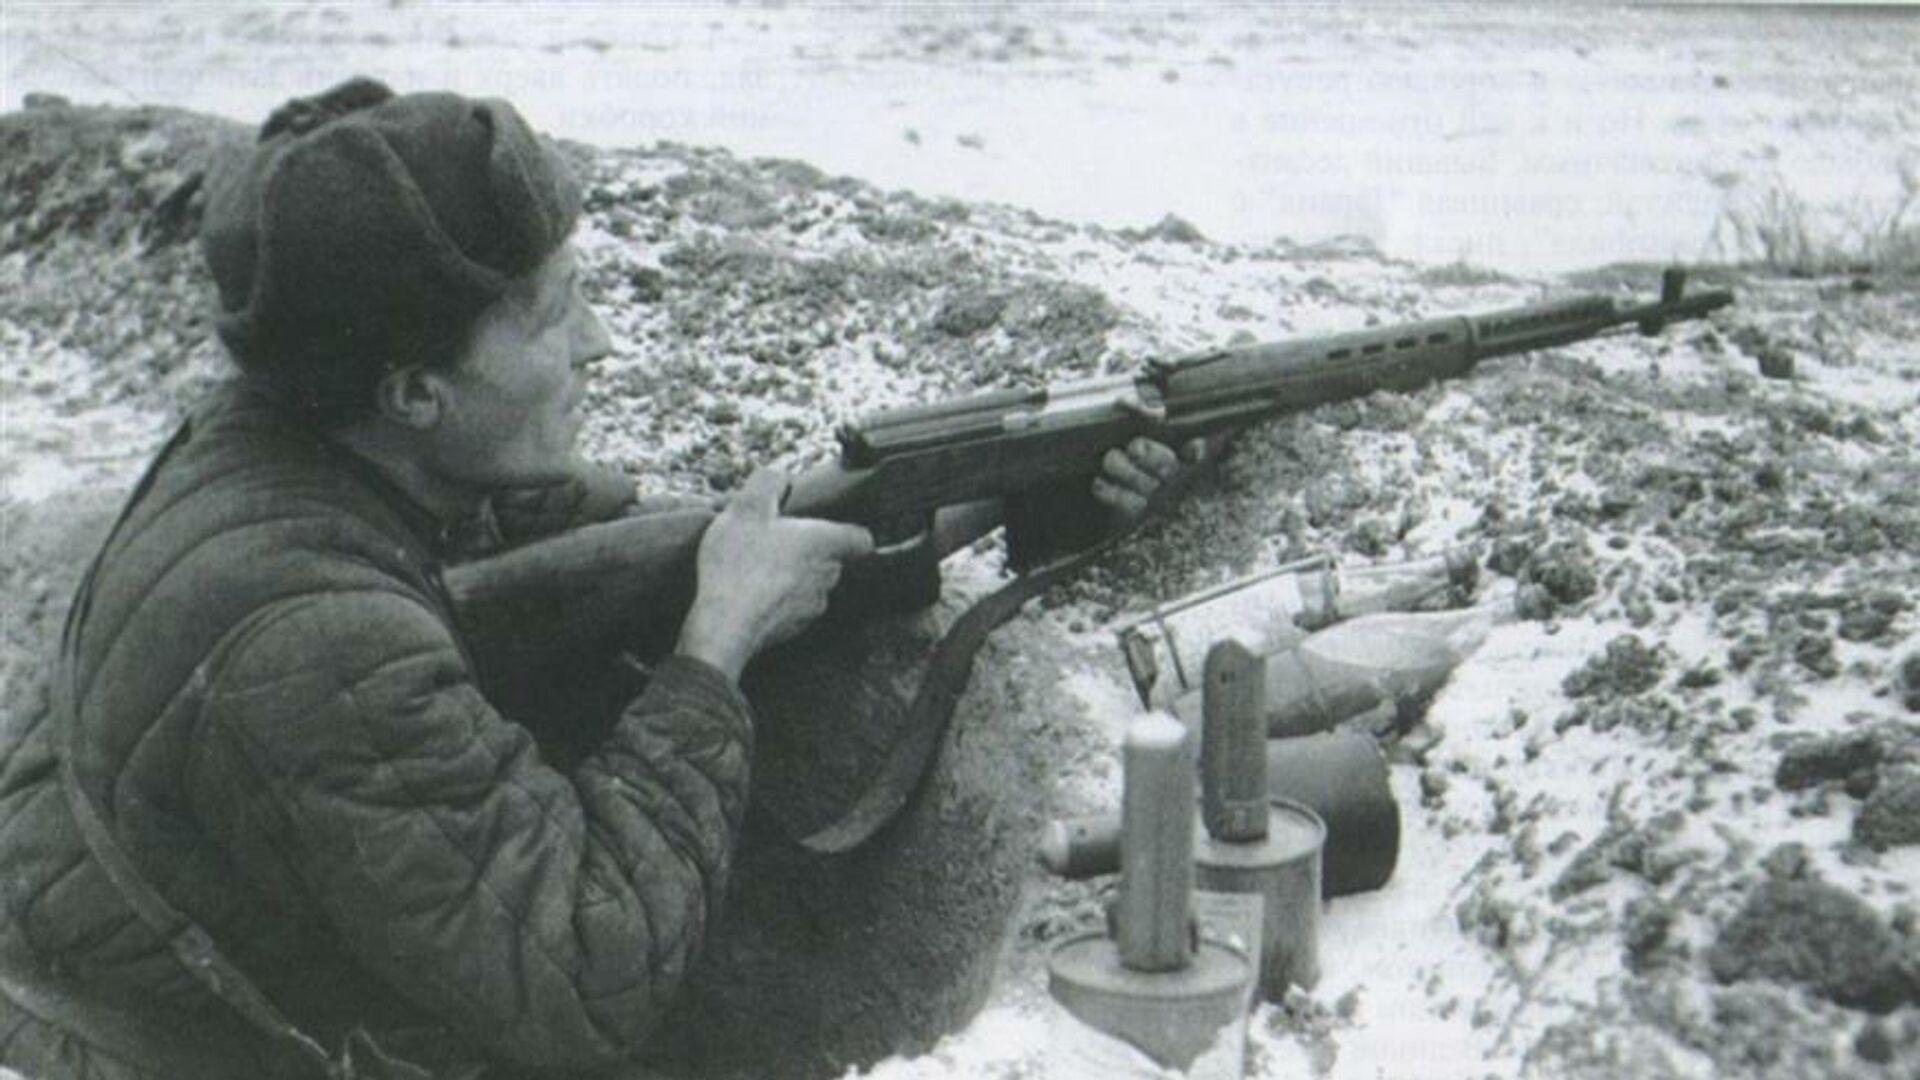 Битва за Москву осенью 1941 года - РИА Новости, 1920, 05.12.2020